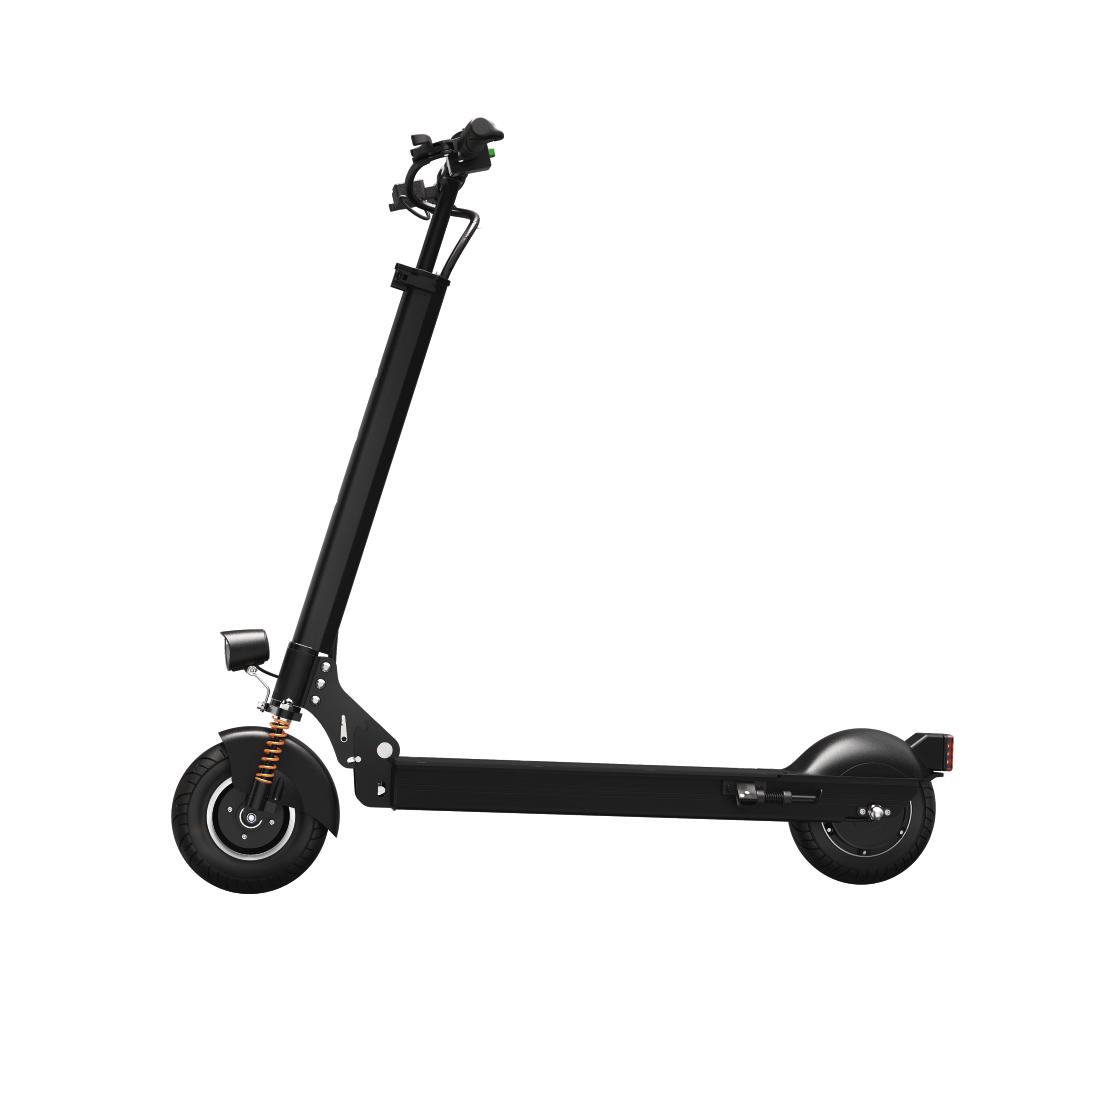 00109870 hama urban scooter scooter 8 black made in. Black Bedroom Furniture Sets. Home Design Ideas